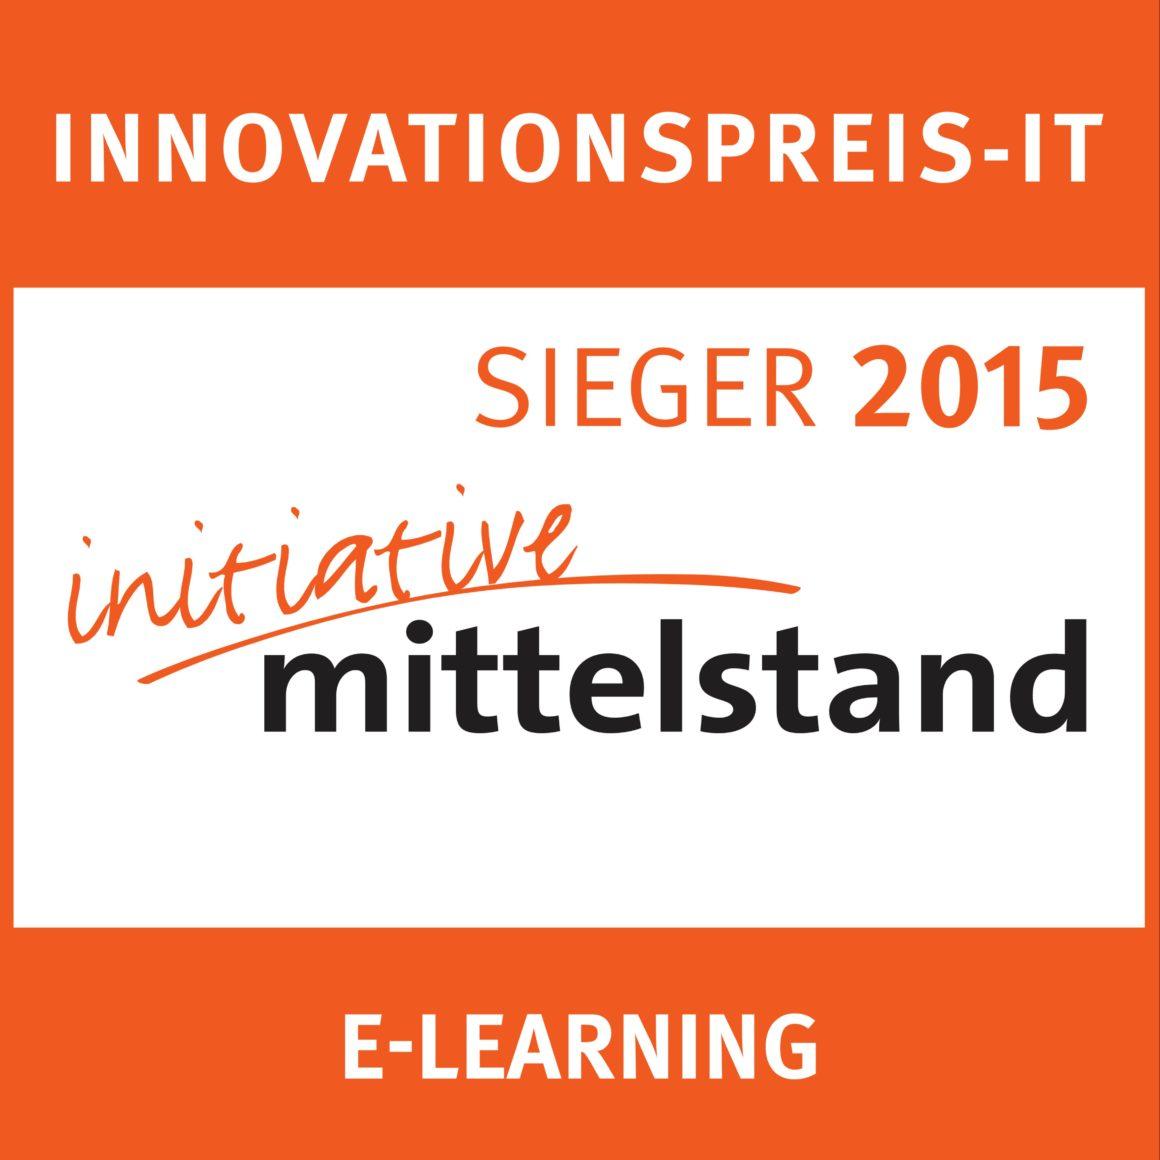 Brainyoo gewinnt INNOVATIONSPREIS-IT 2015 im Bereich E-Learning